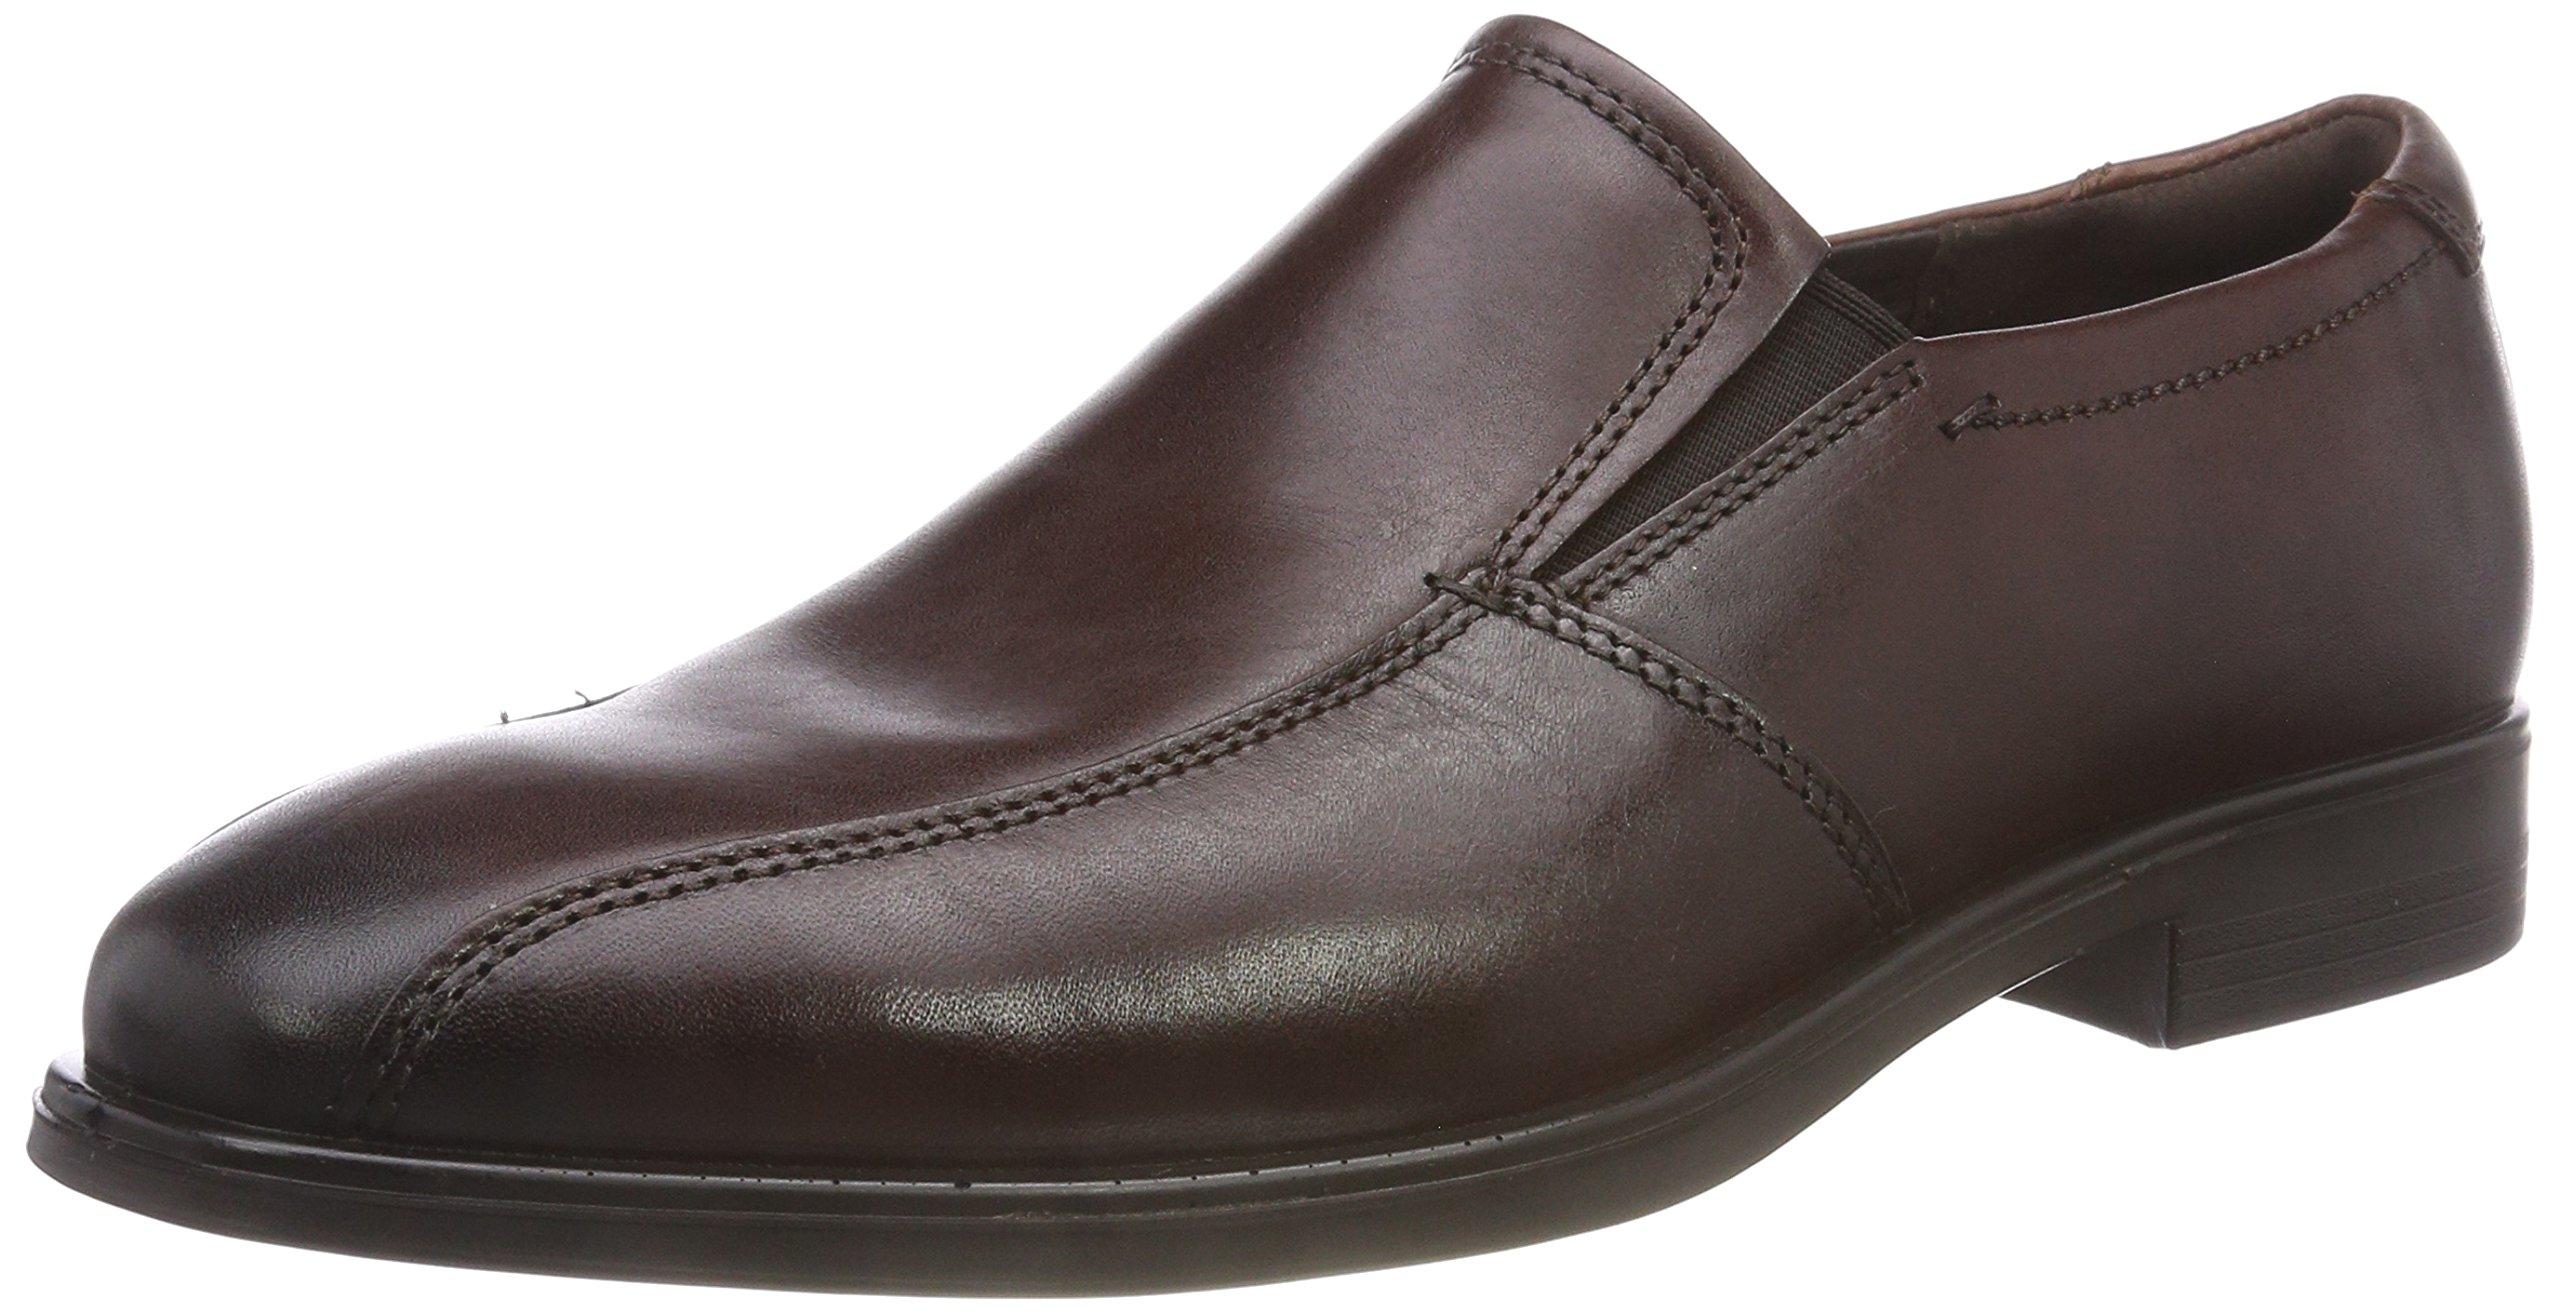 ECCO 男士 Melbourne 低帮拖鞋